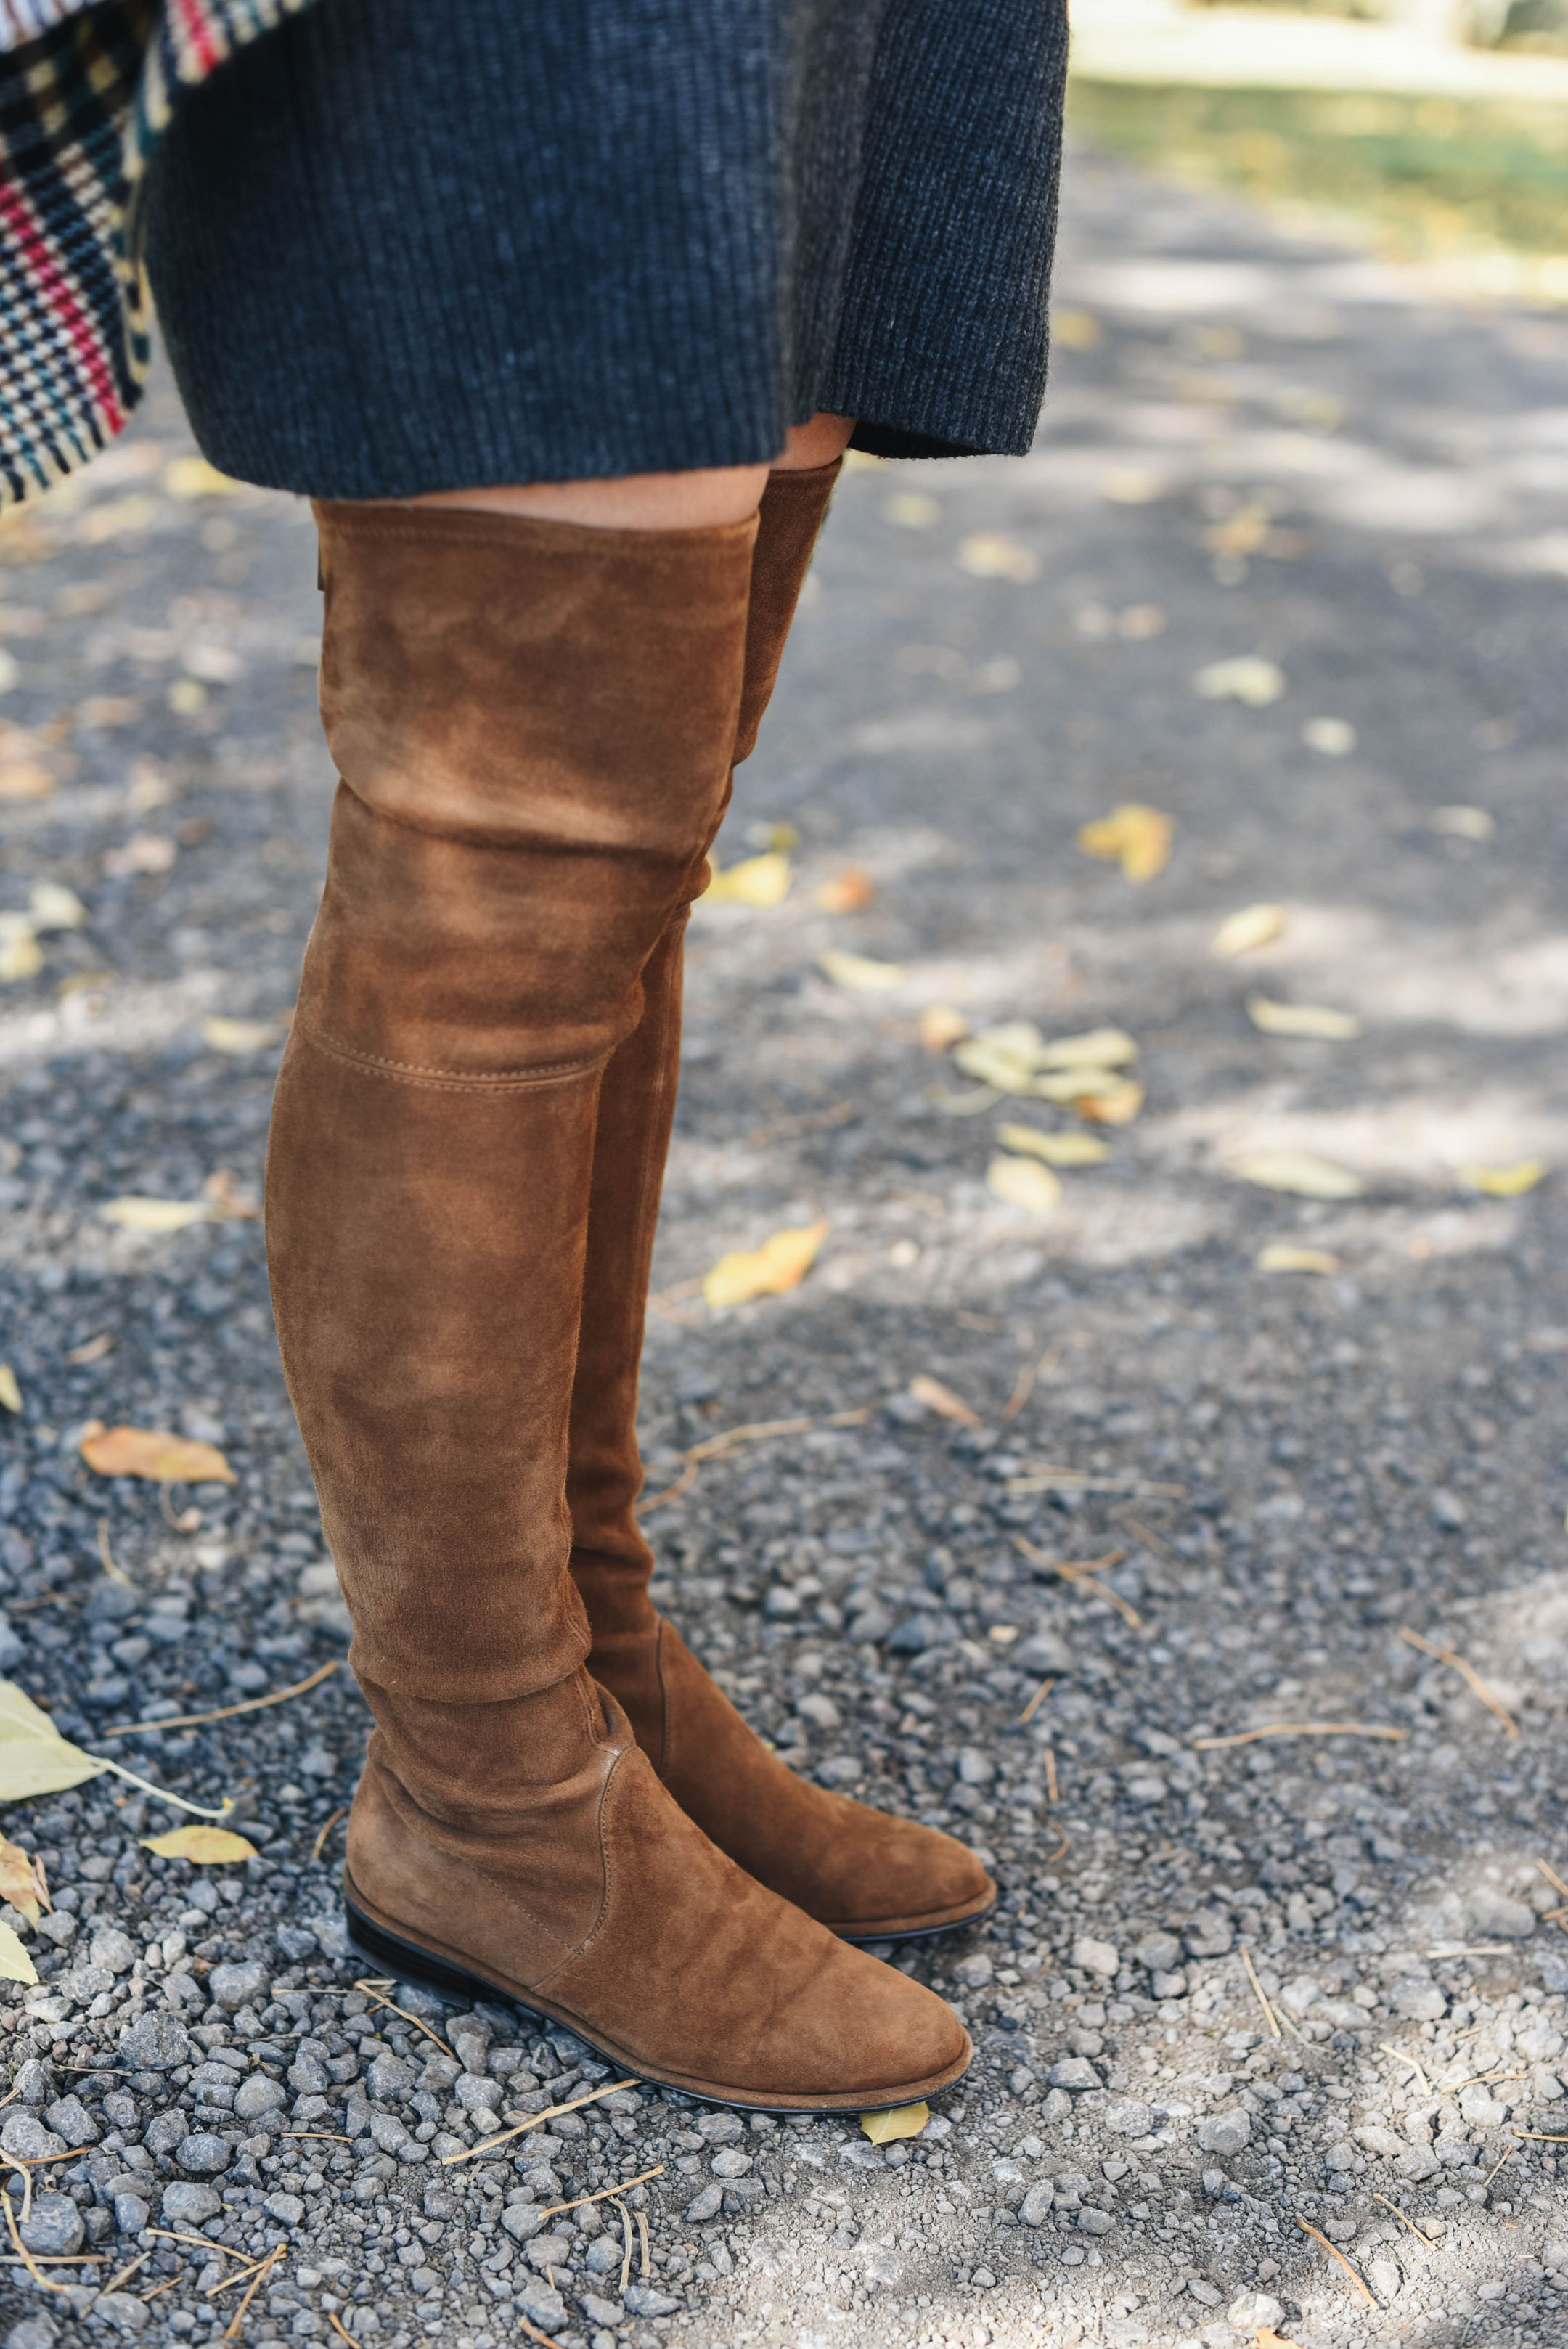 Stuart Weitzman lowland OTK boots in nutmeg